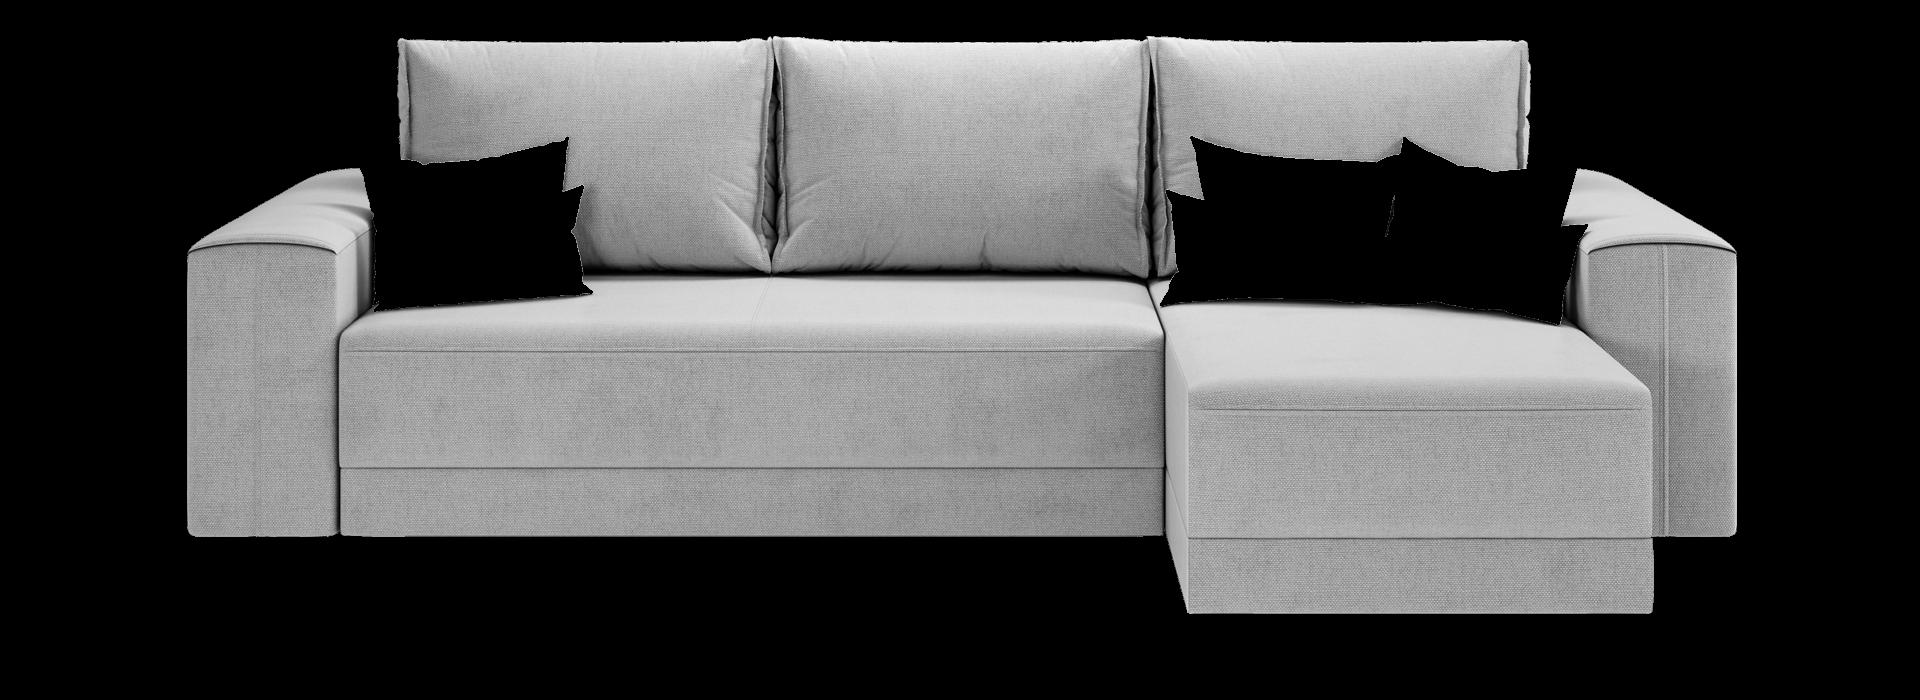 Роско кутовий диван - маска 1